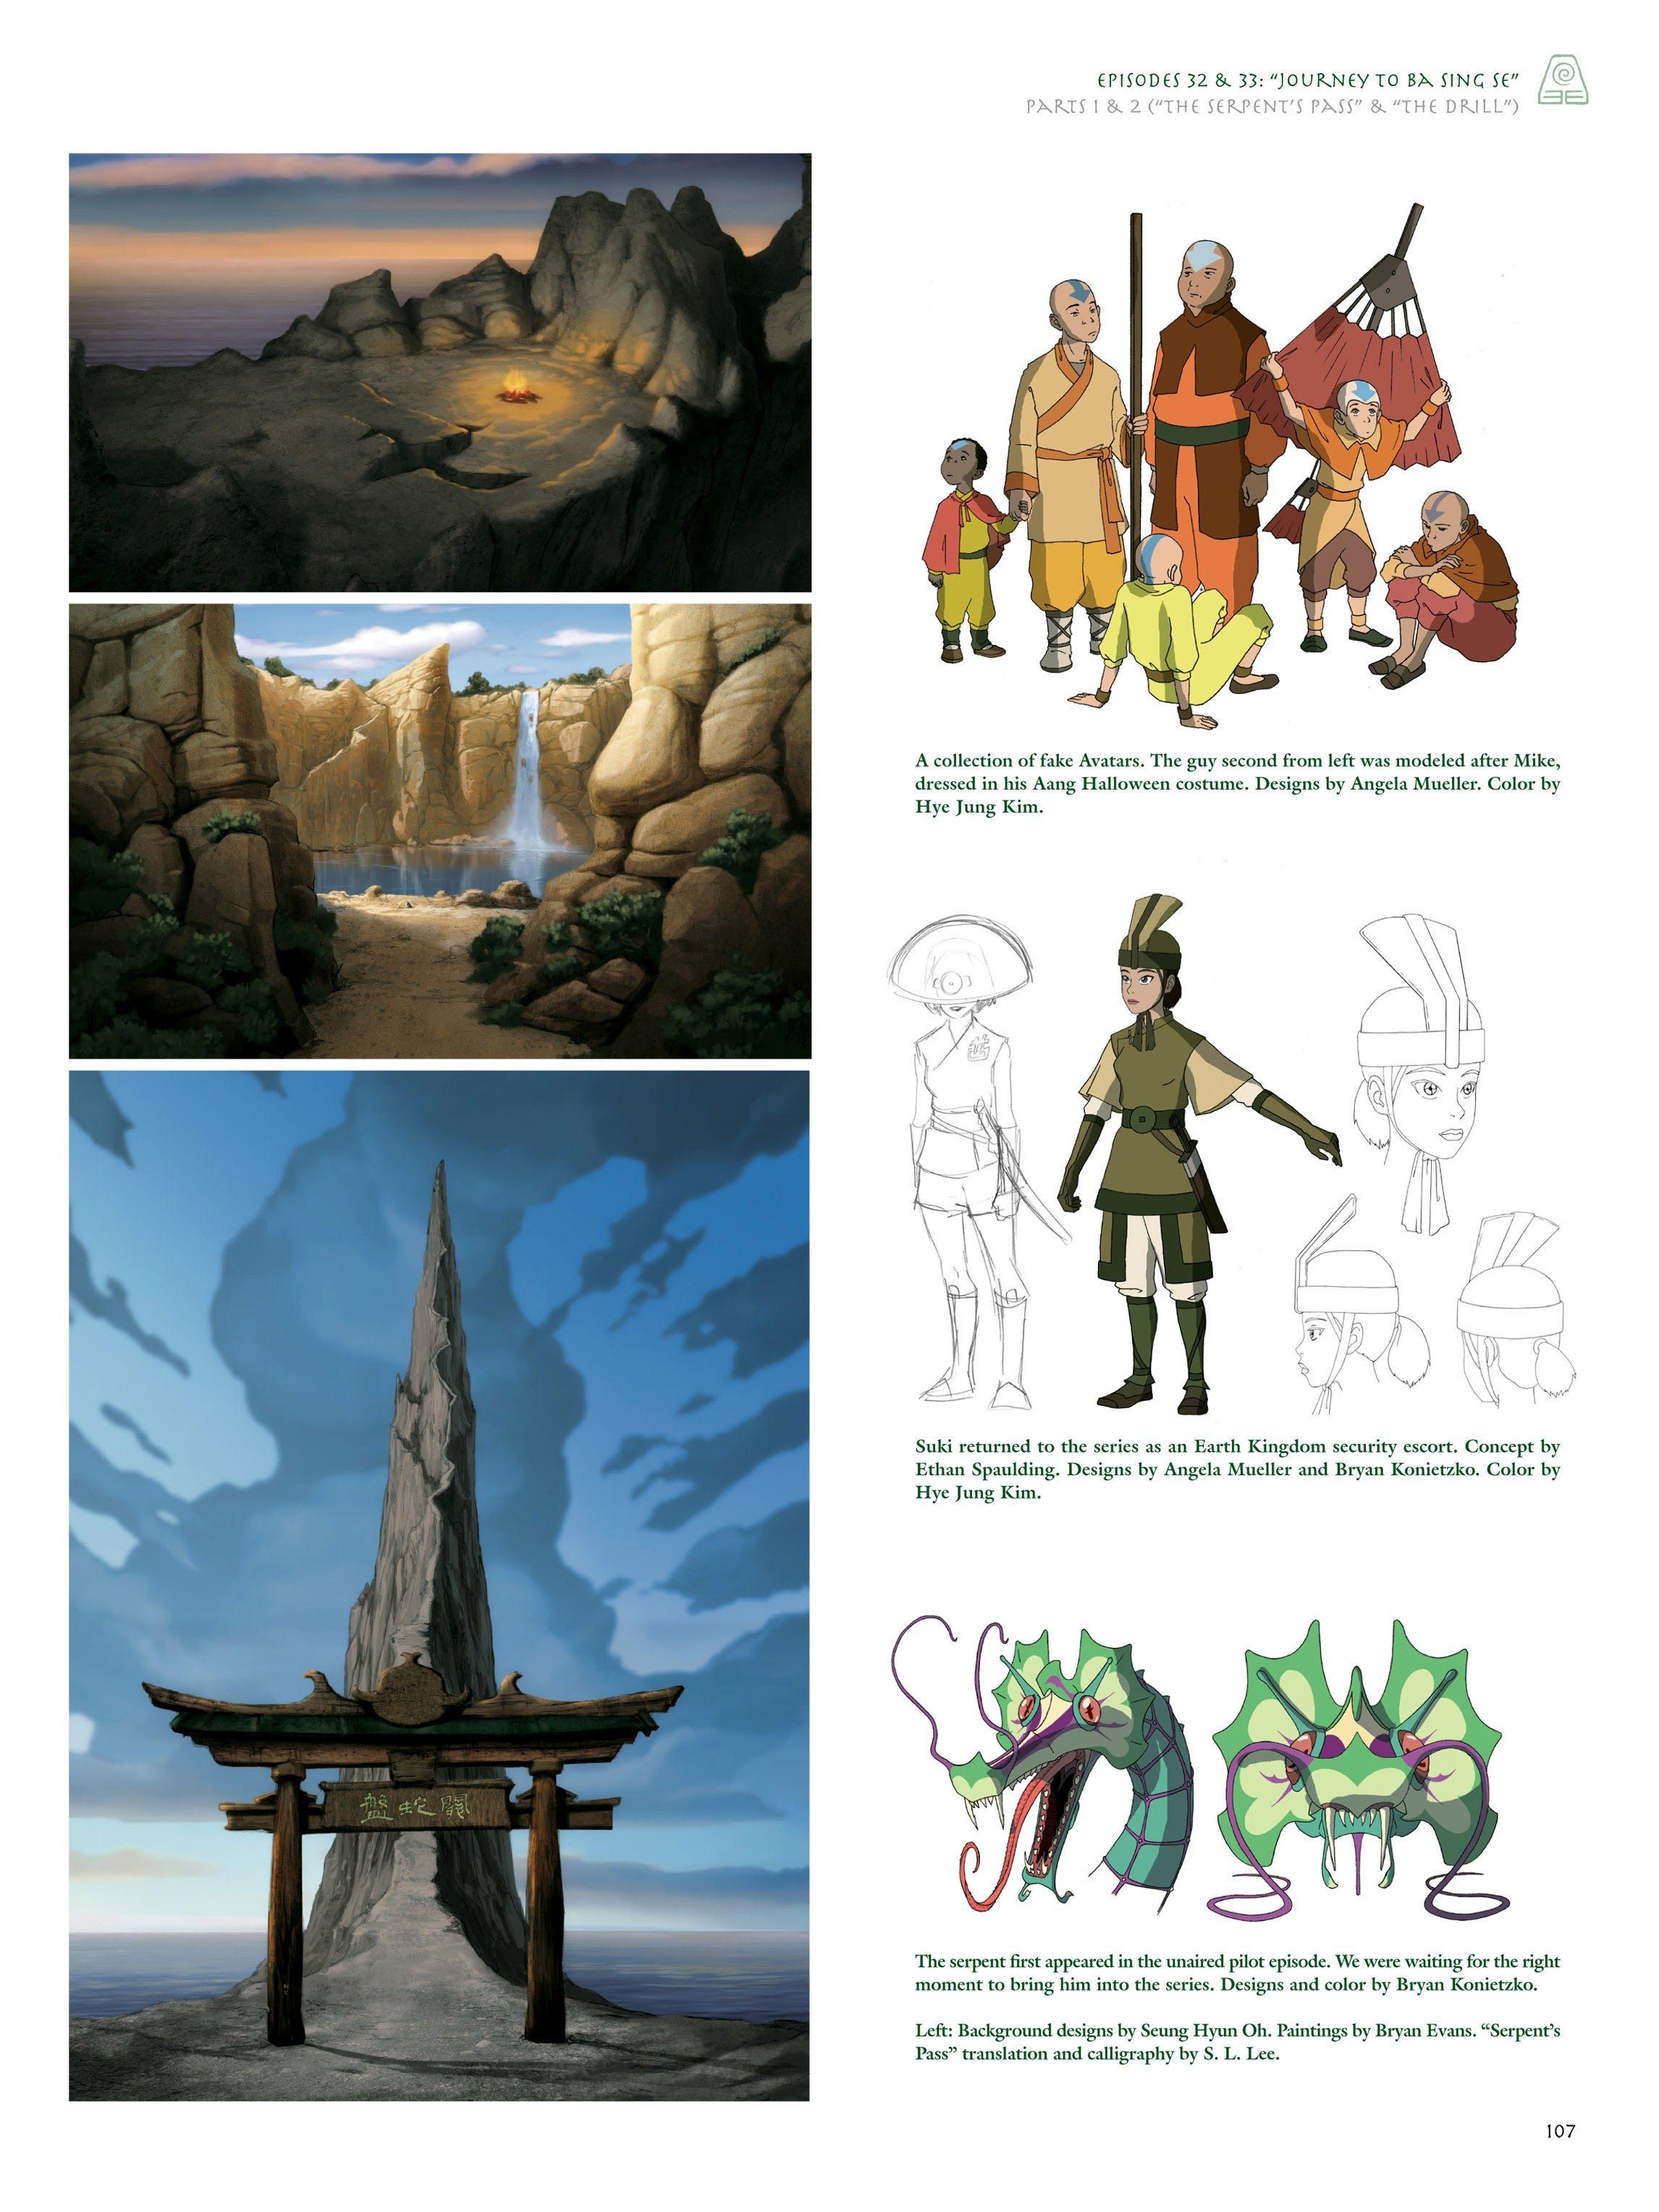 Avatar The Last Airbender Pilot : avatar, airbender, pilot, Avatar, Airbender, Animated, Series, Viewcomic, Reading, Comics, Online, Fre…, Airbender,